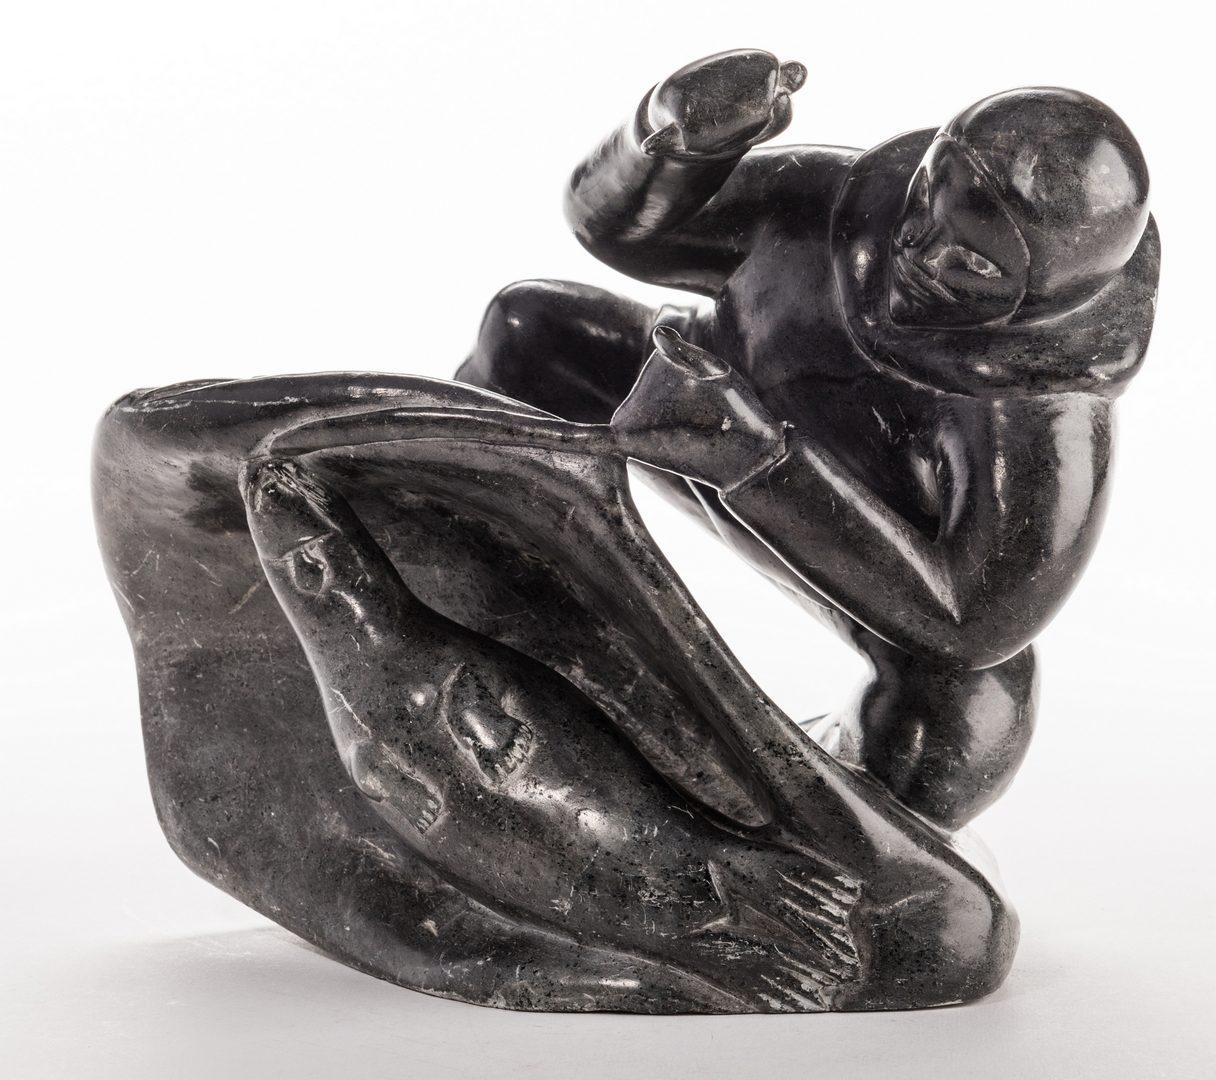 Lot 397: Large Soapstone Inuit Carving, Eliassiapik